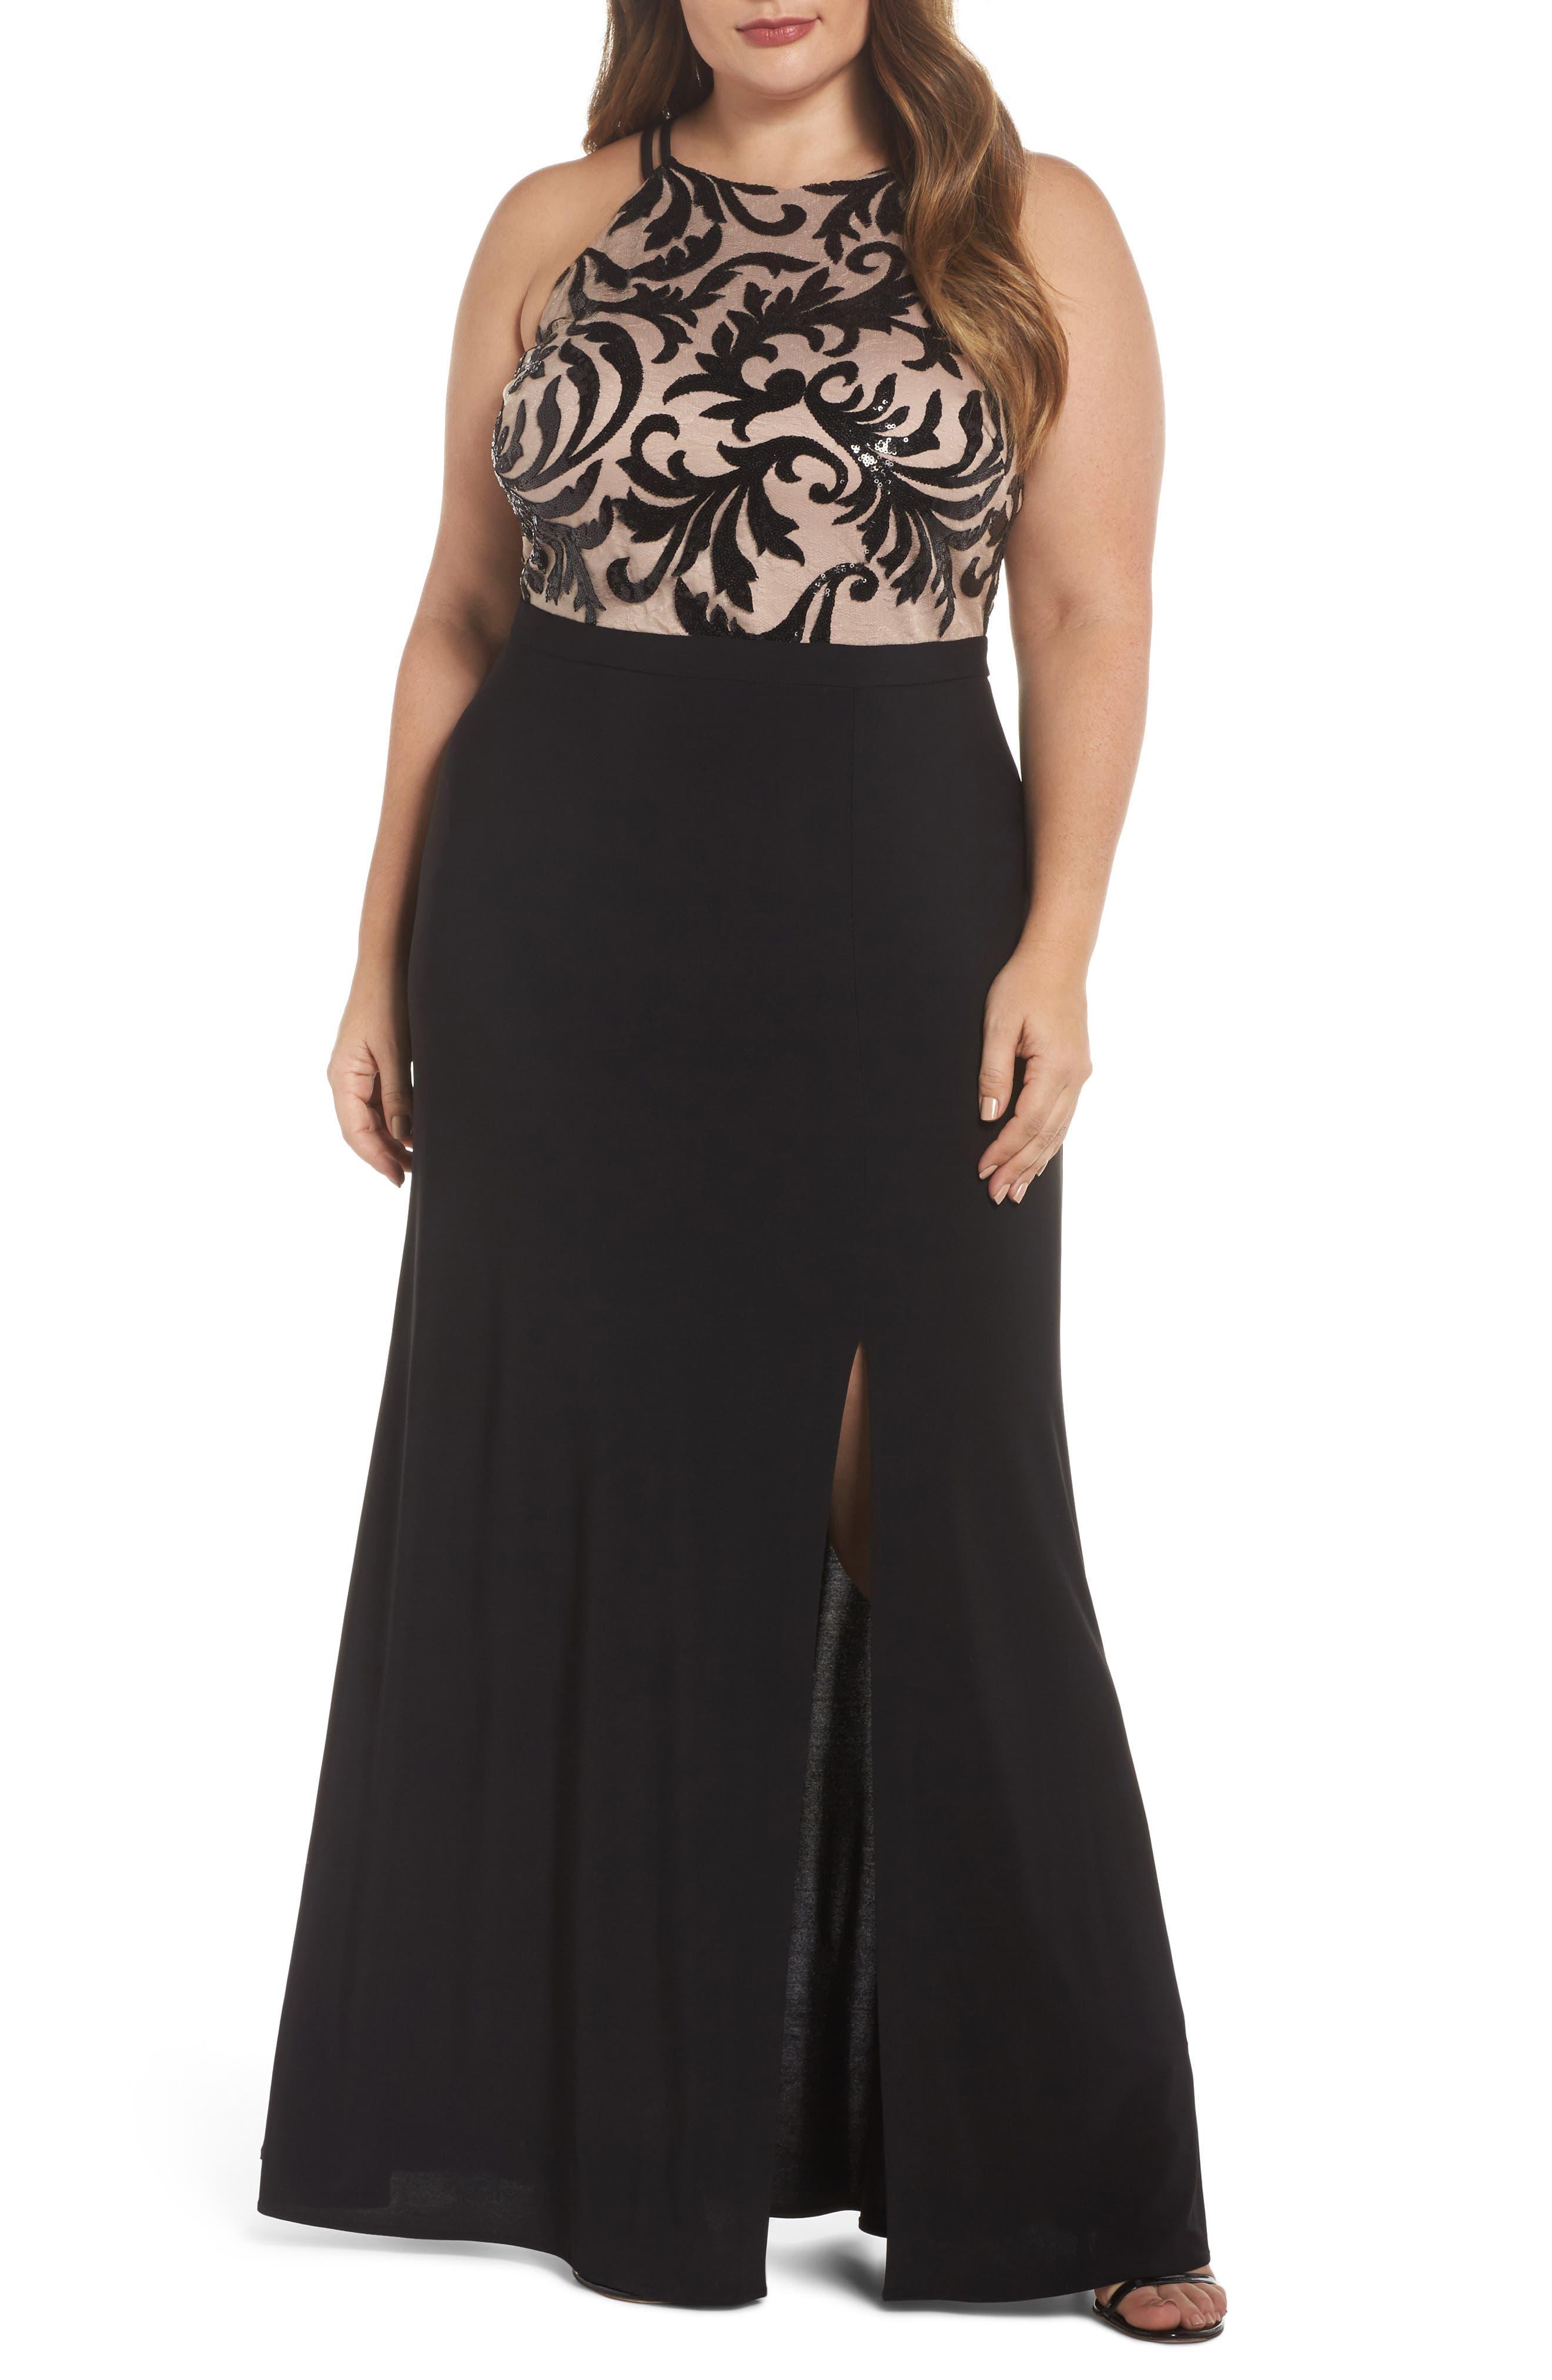 Main Image - Morgan & Co. Sequin Bodice Gown (Plus Size)